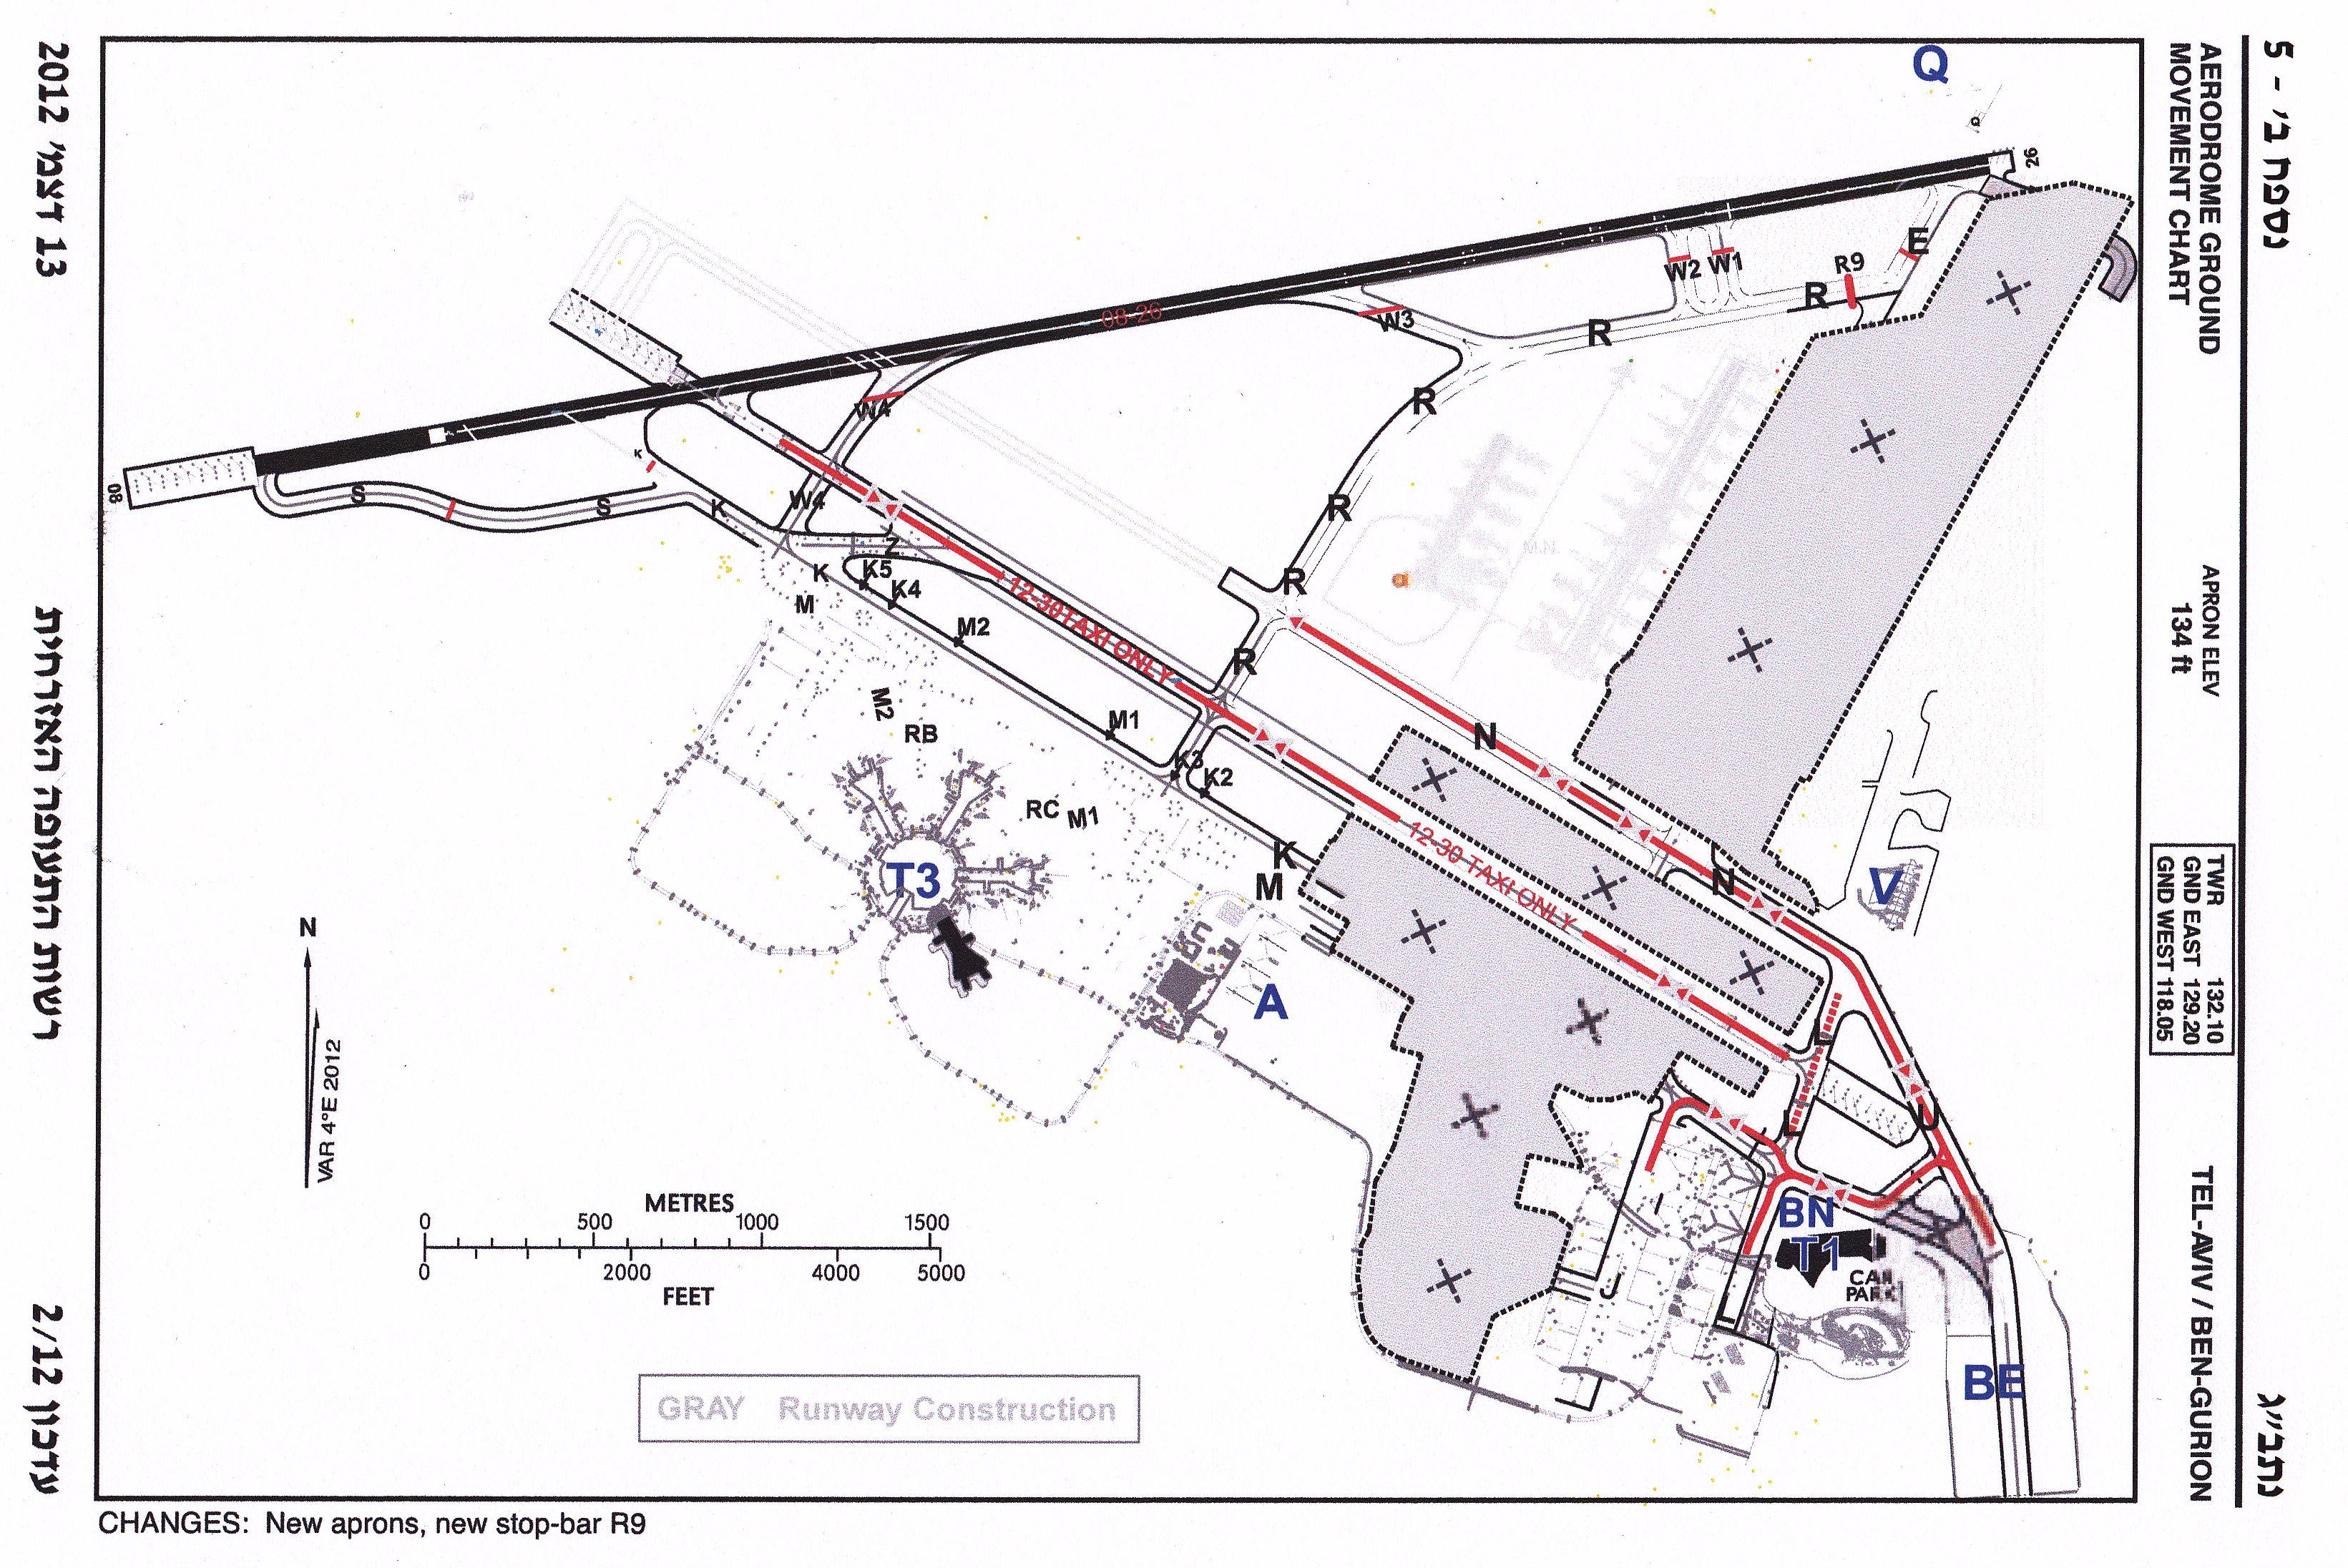 Tel Aviv Airport Ben Gurion Runway Expansion